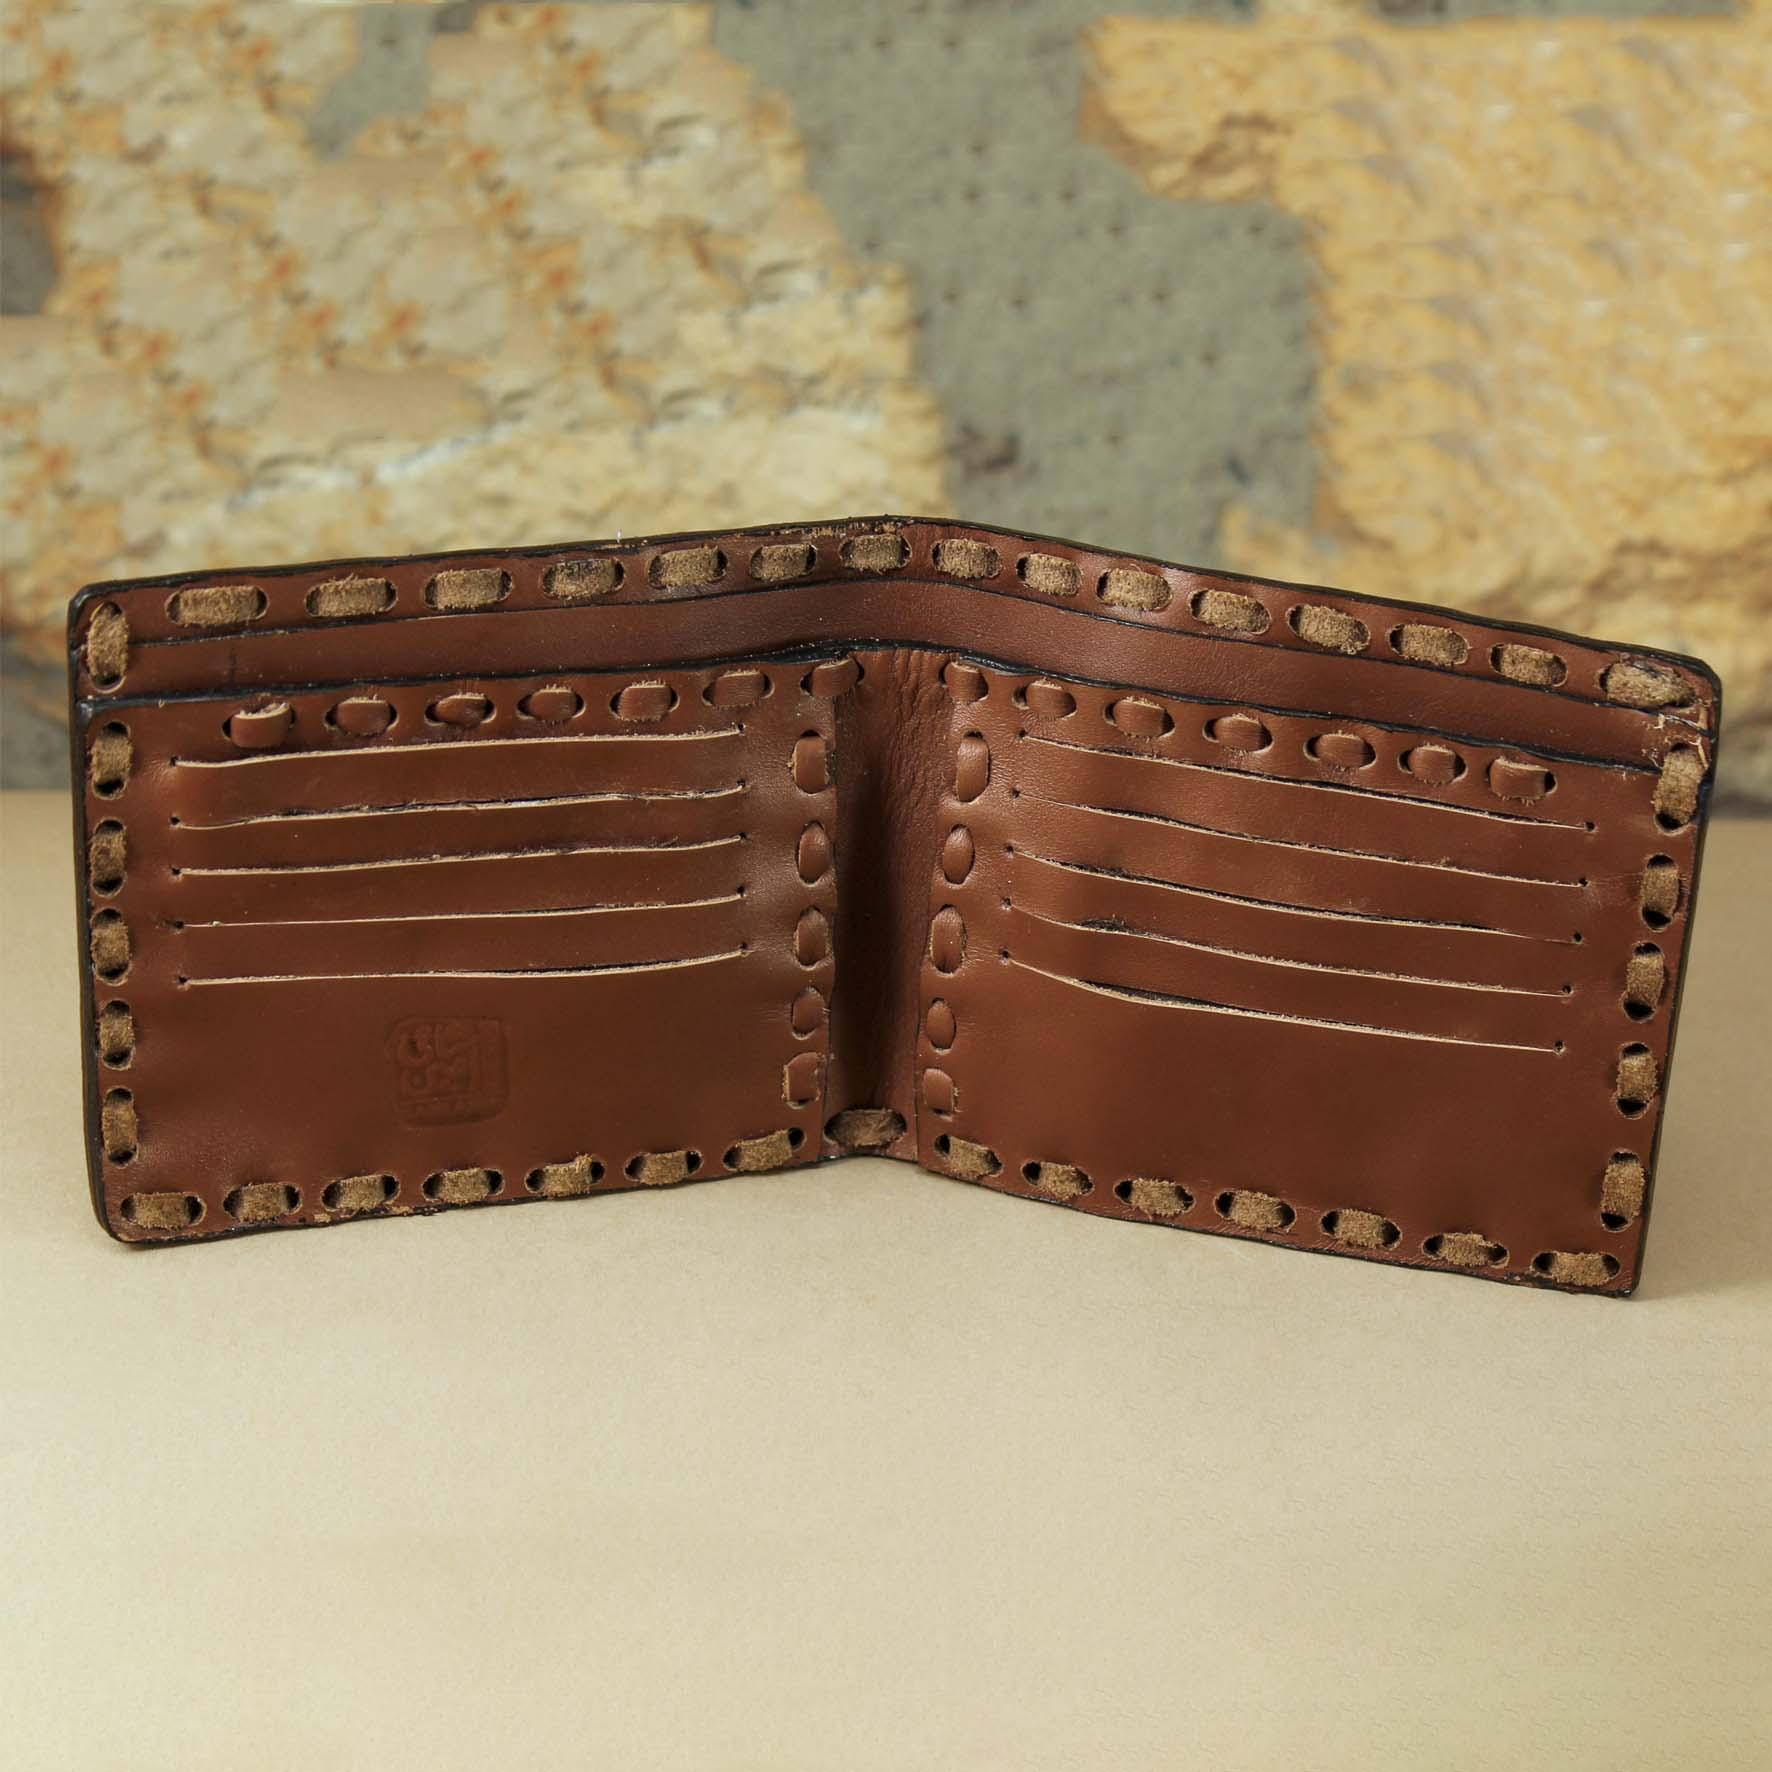 Basic Cards Wallet